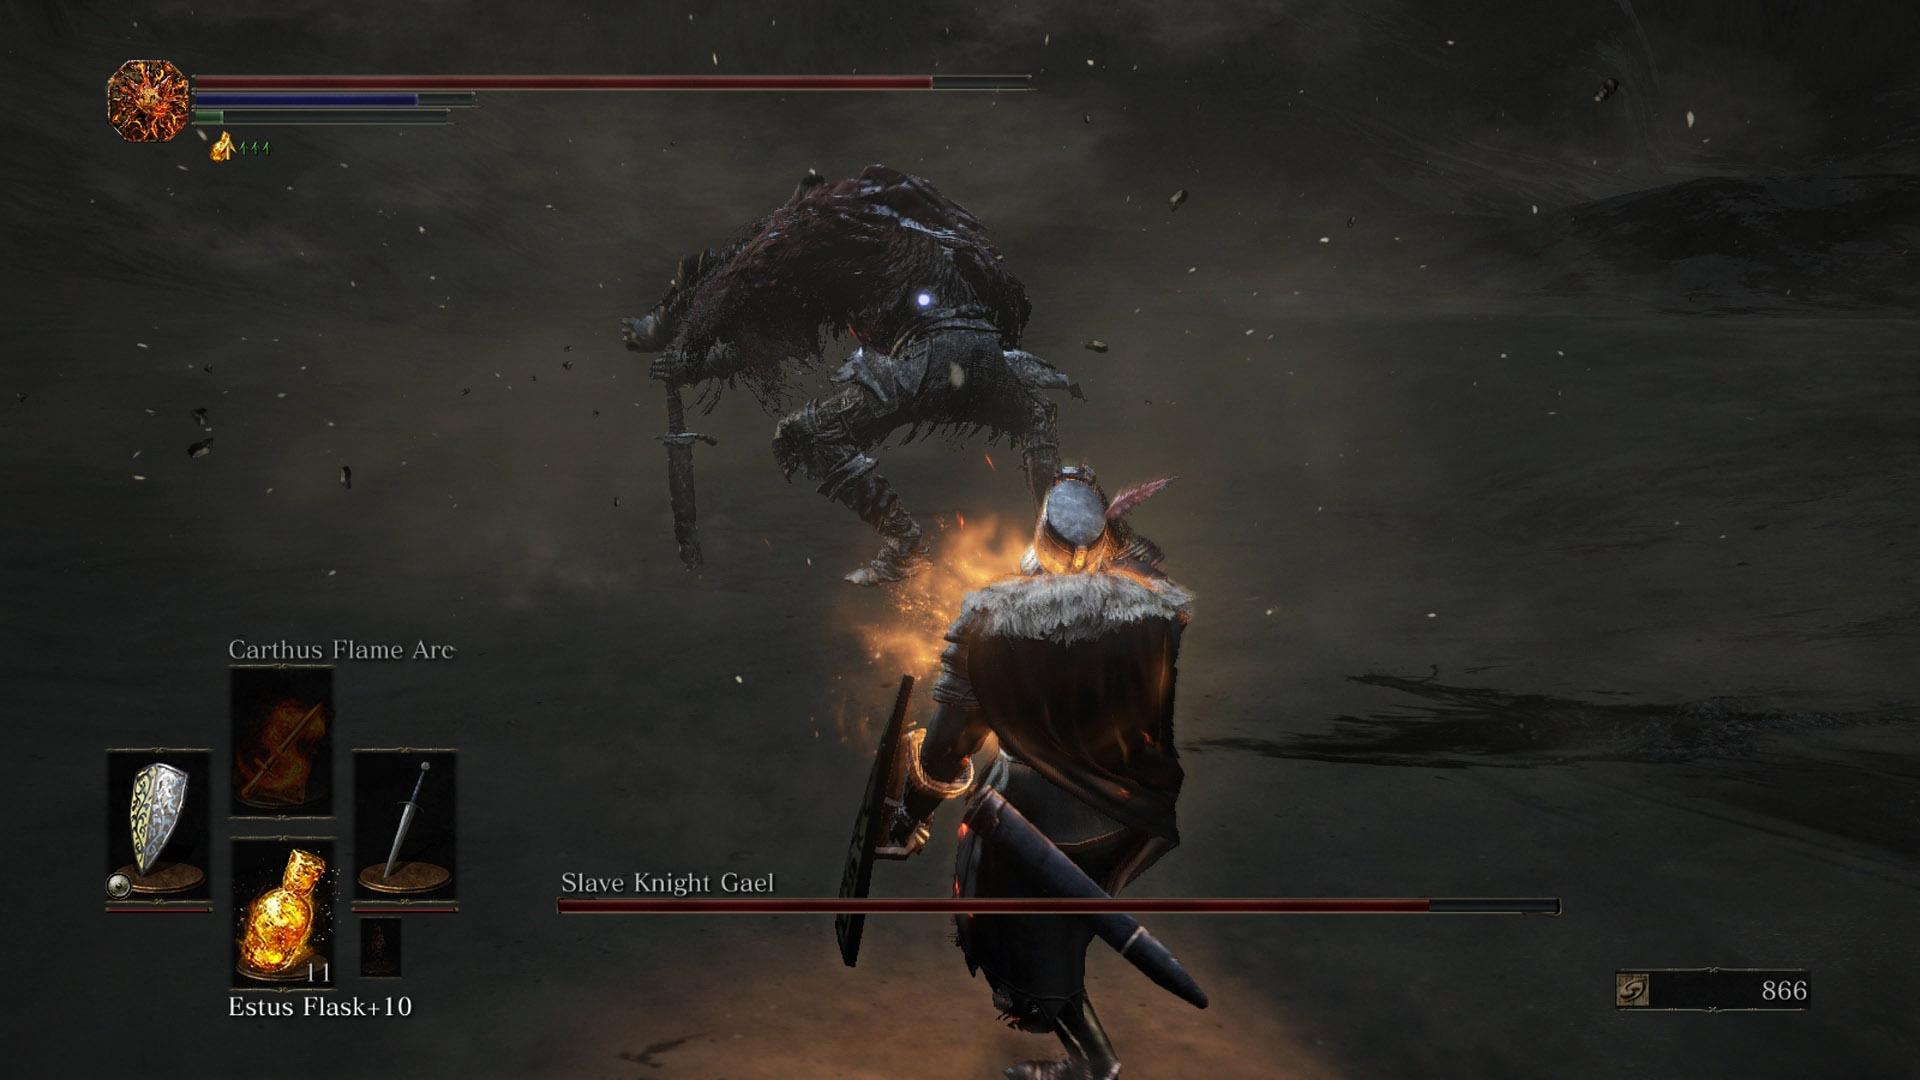 Dark Souls 3 - How to Kill Slave Knight Gael | AllGamers